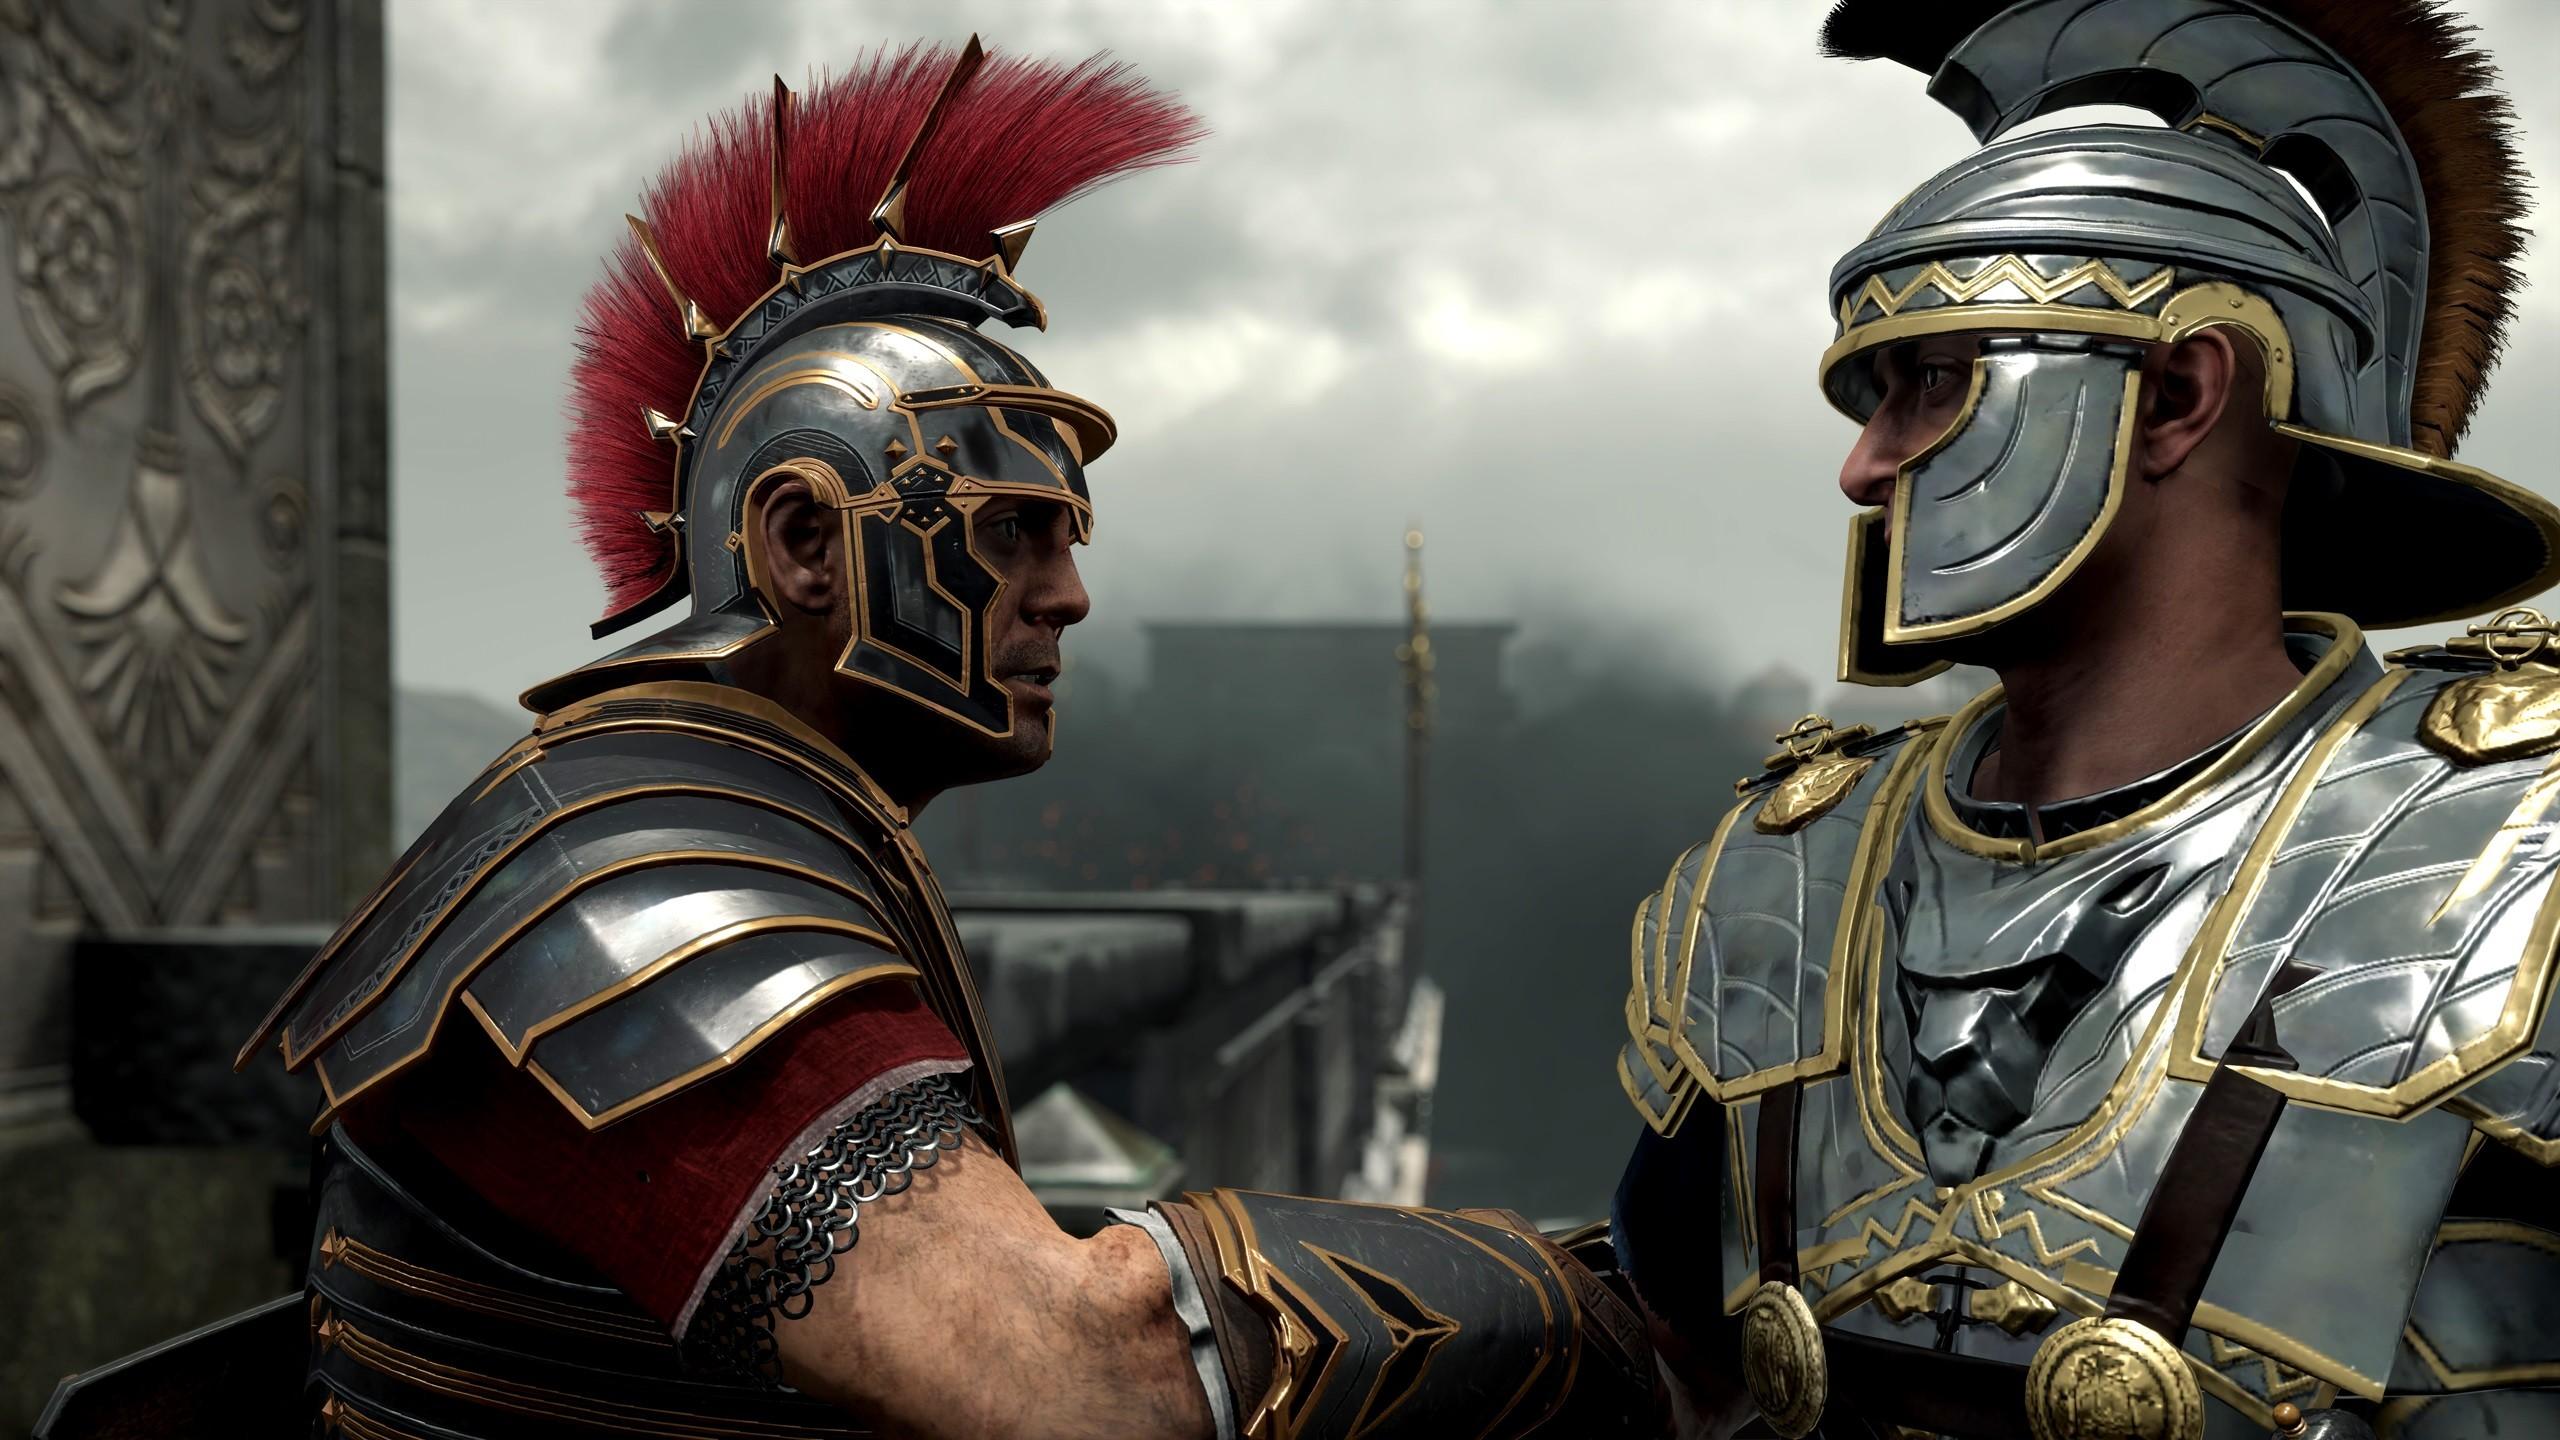 Roman Soldier Wallpaper 70 Images